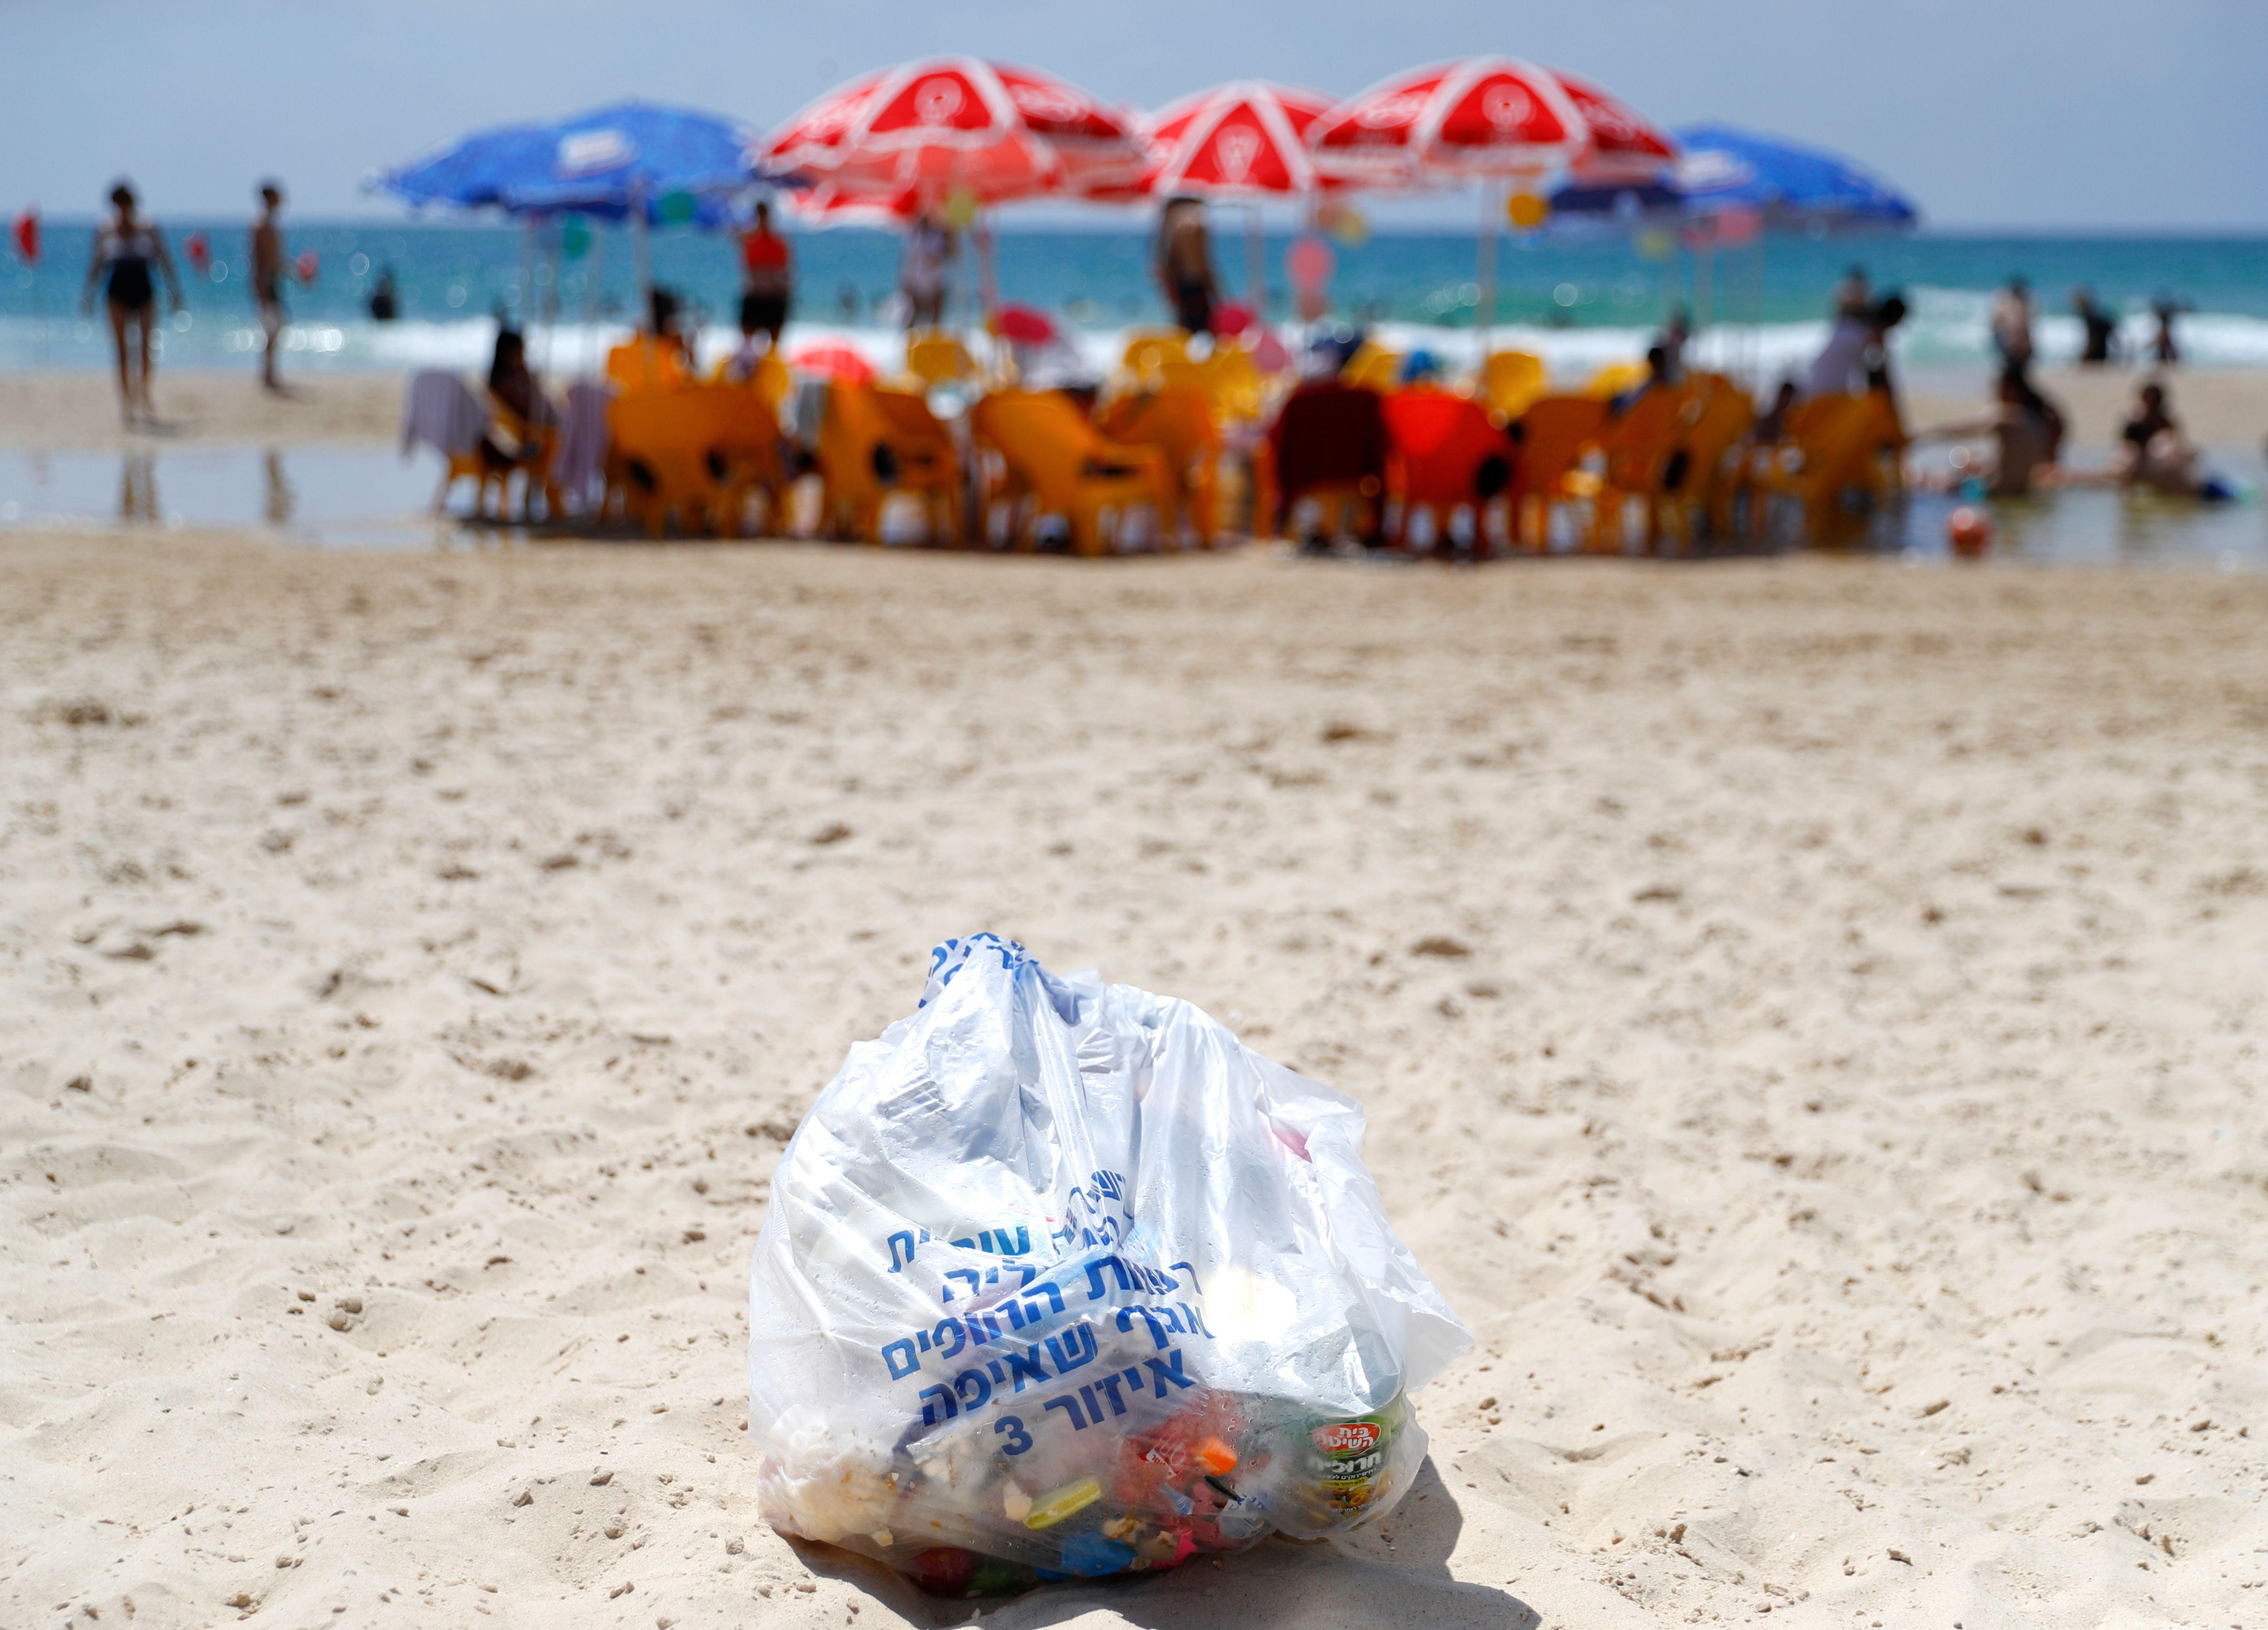 Plastic trash bag on beach